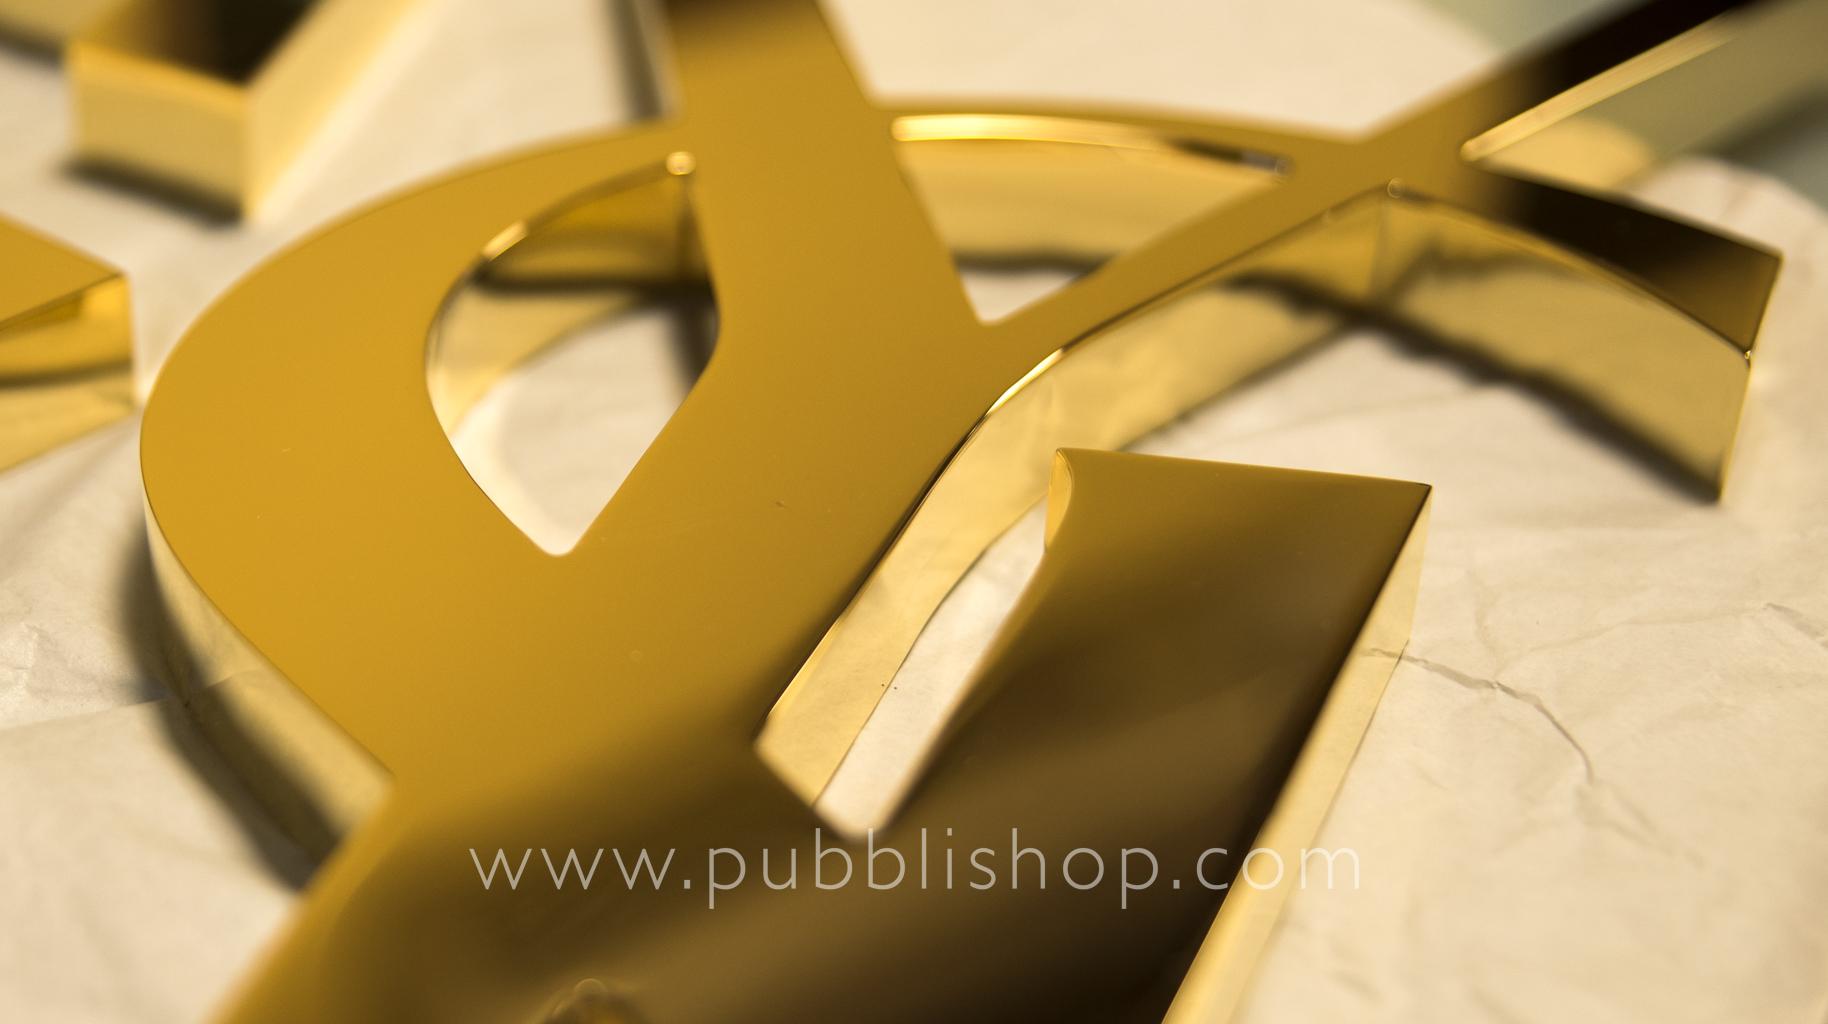 SAINT LAURENT Logo in ottone scatolato dorato - Logo in ottone scatolato e lucidato manualmente, bagno oro 24K